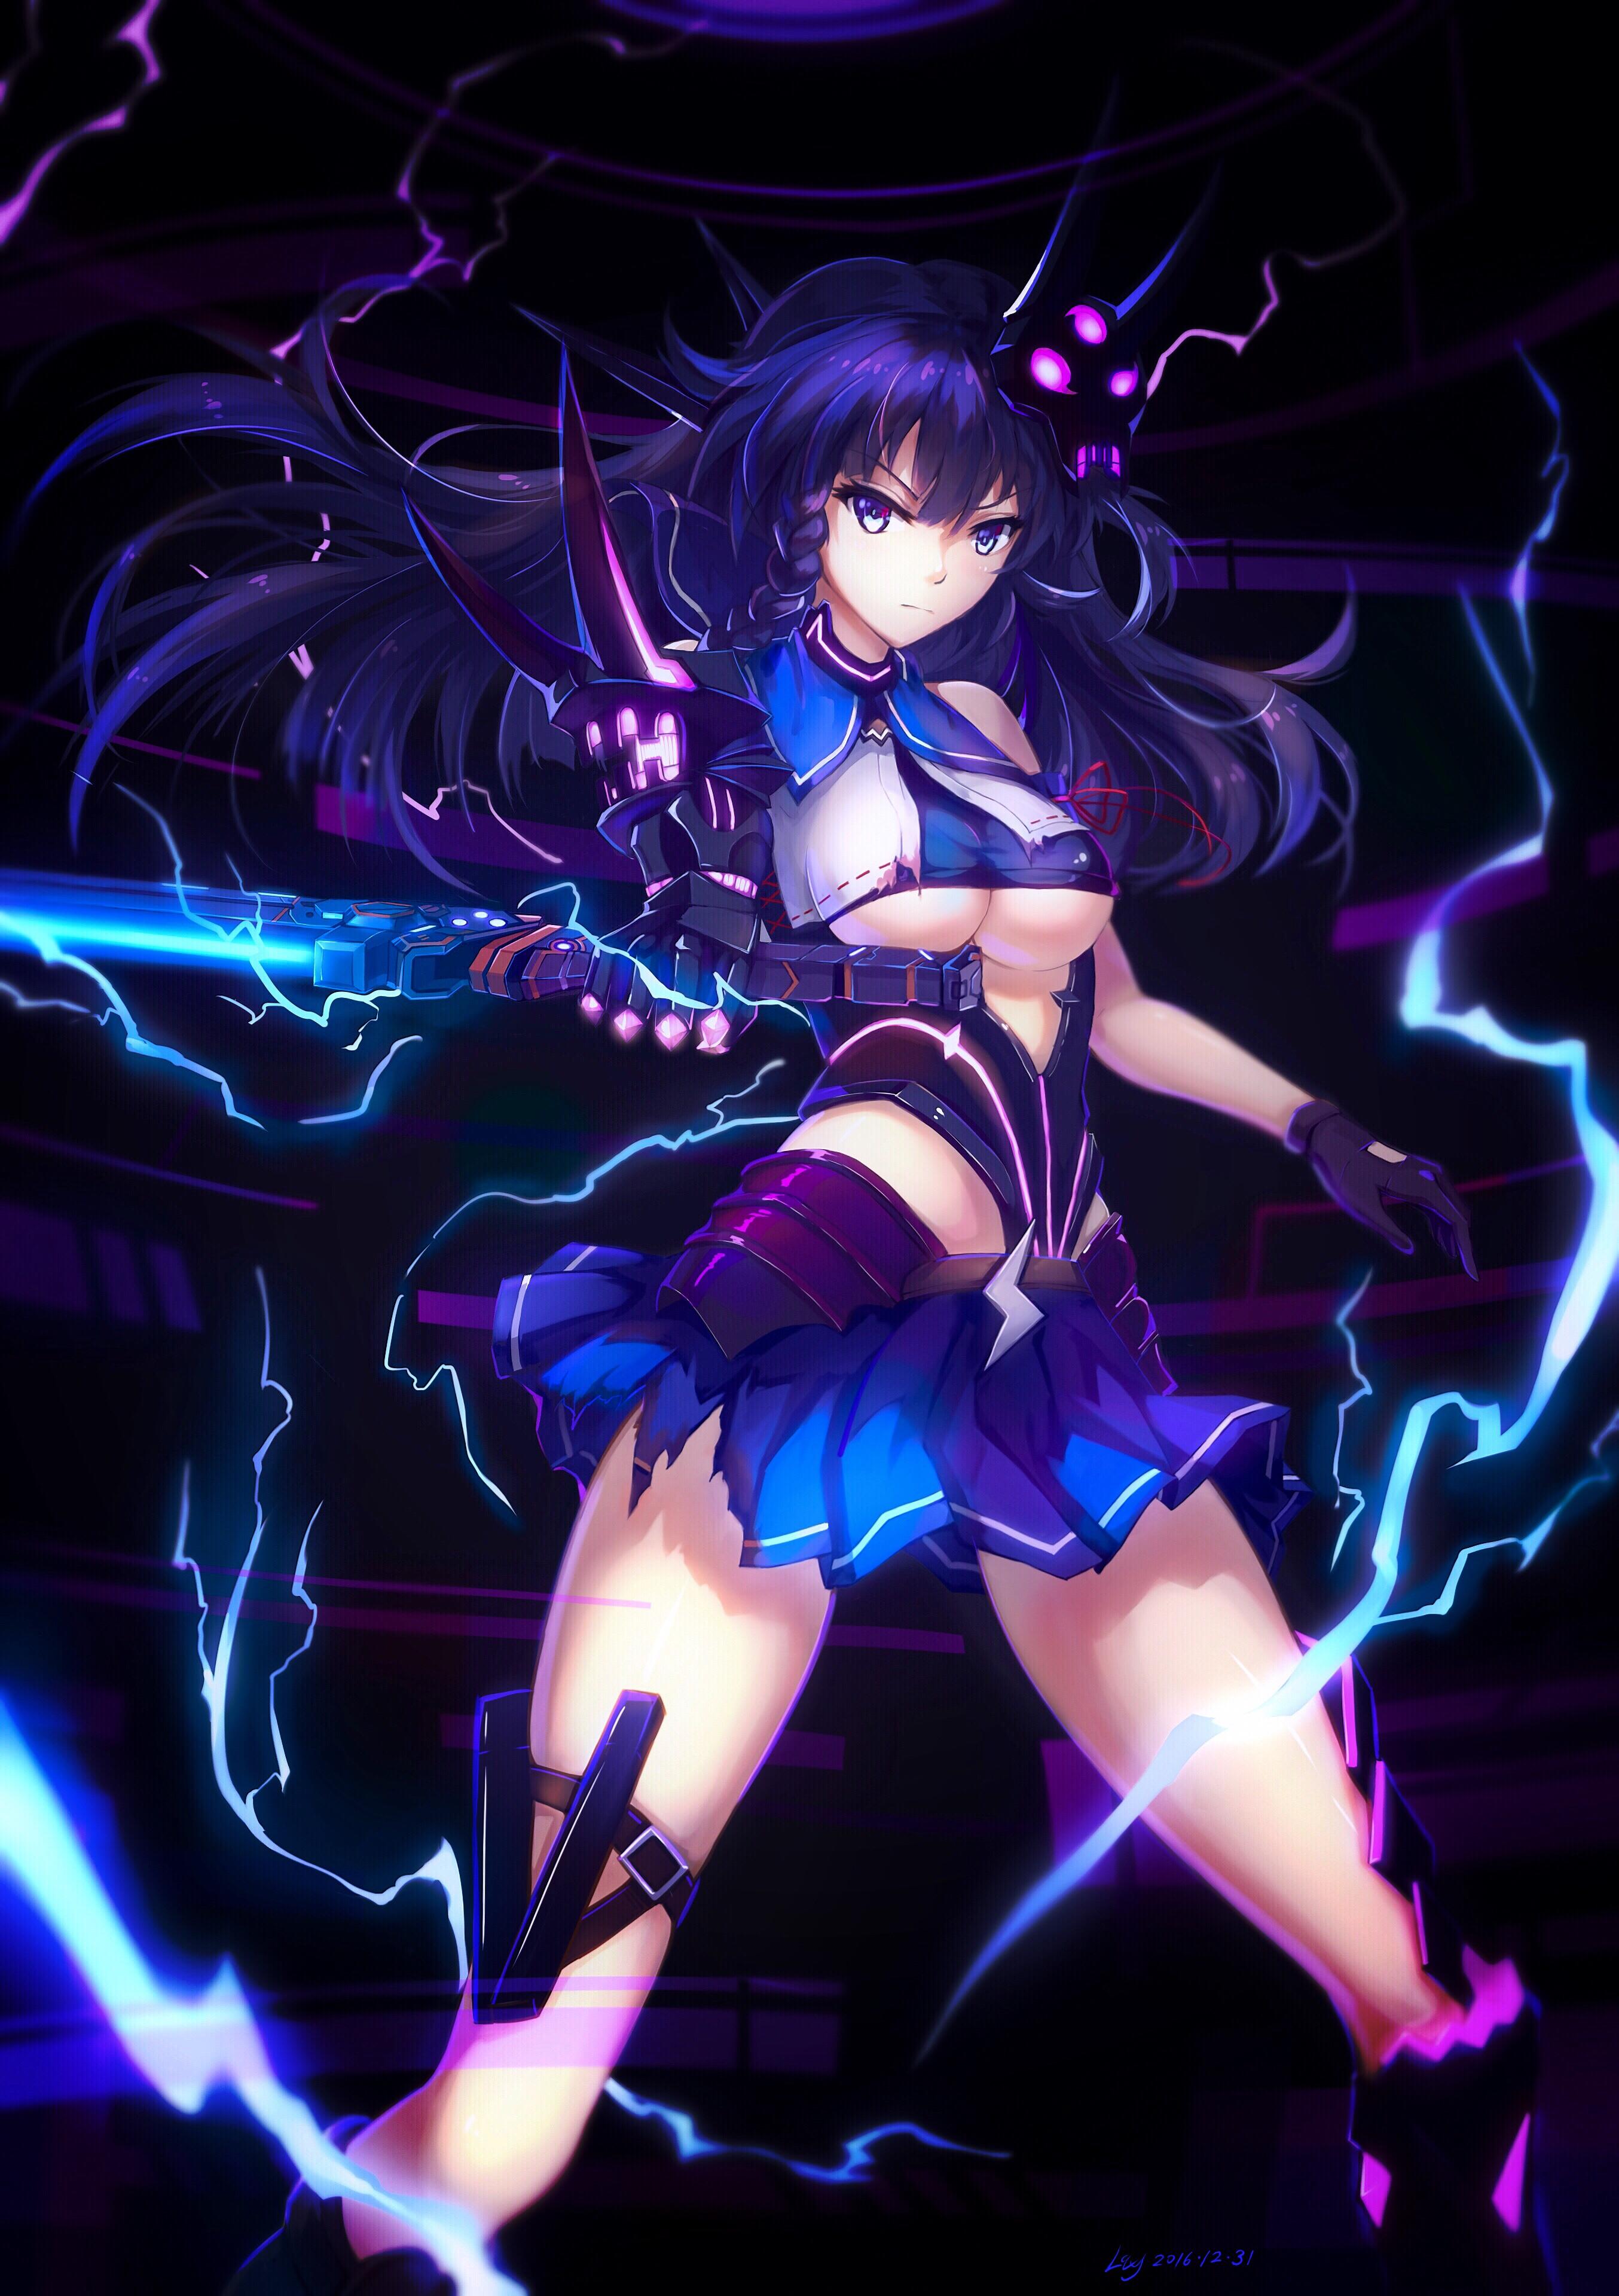 Wallpaper Anime Girls Honkai Impact 2708x3840 Folgest